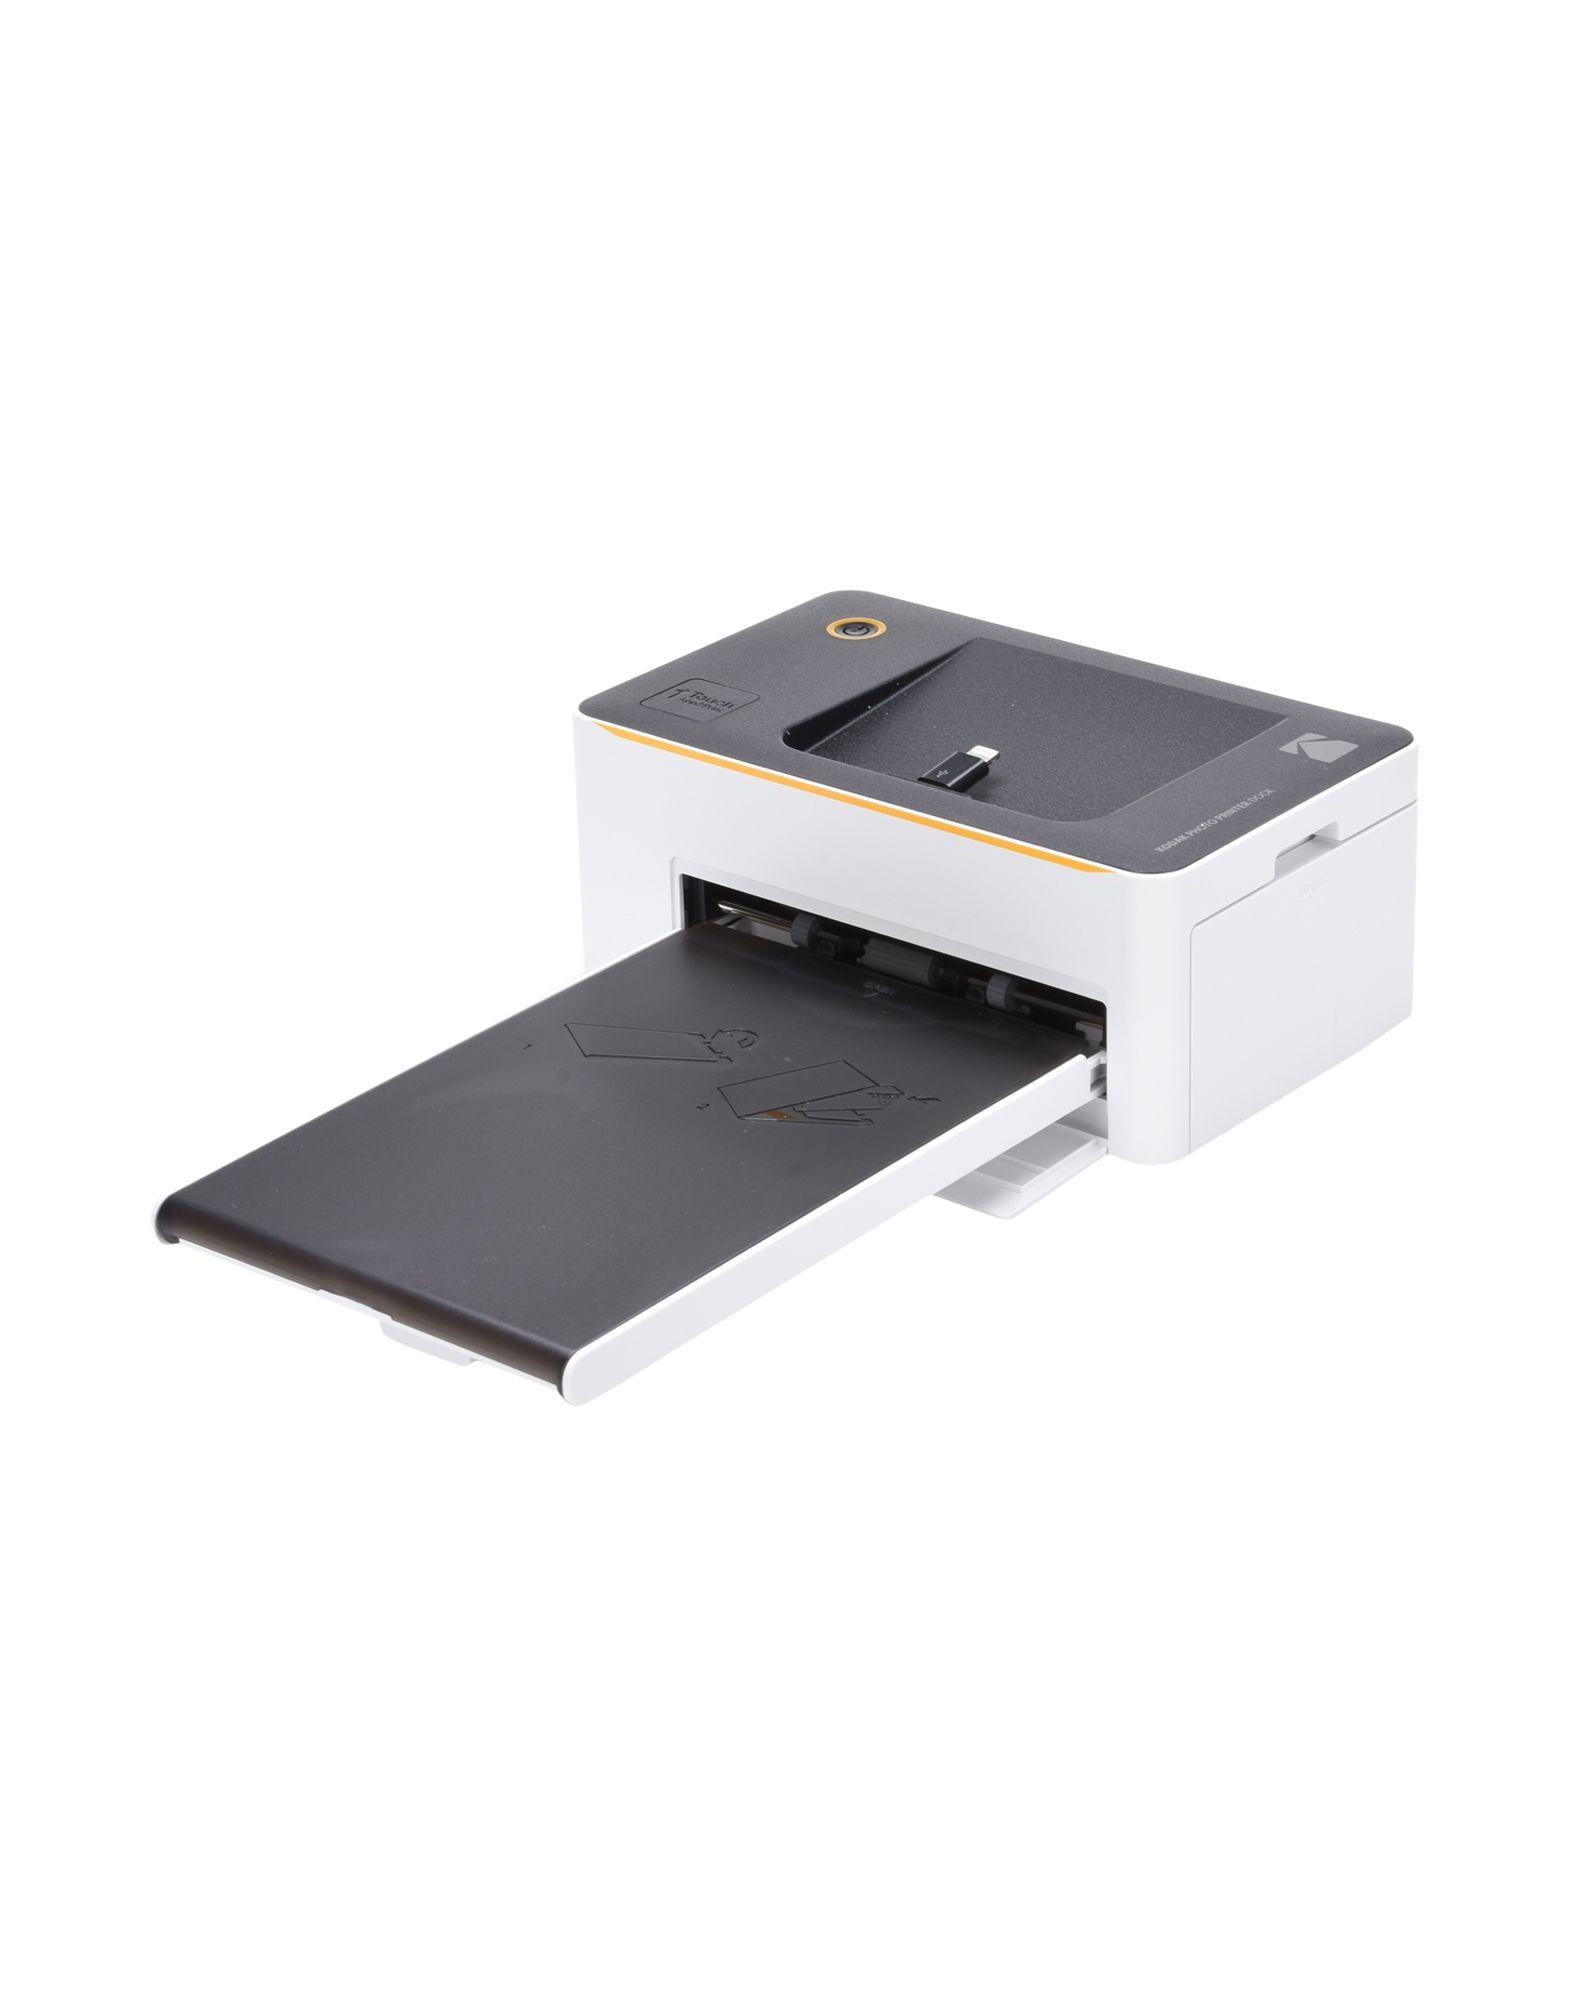 Foto E Video Kodak Kodak Photo Printer Dock Wifi - Uomo - Acquista online su